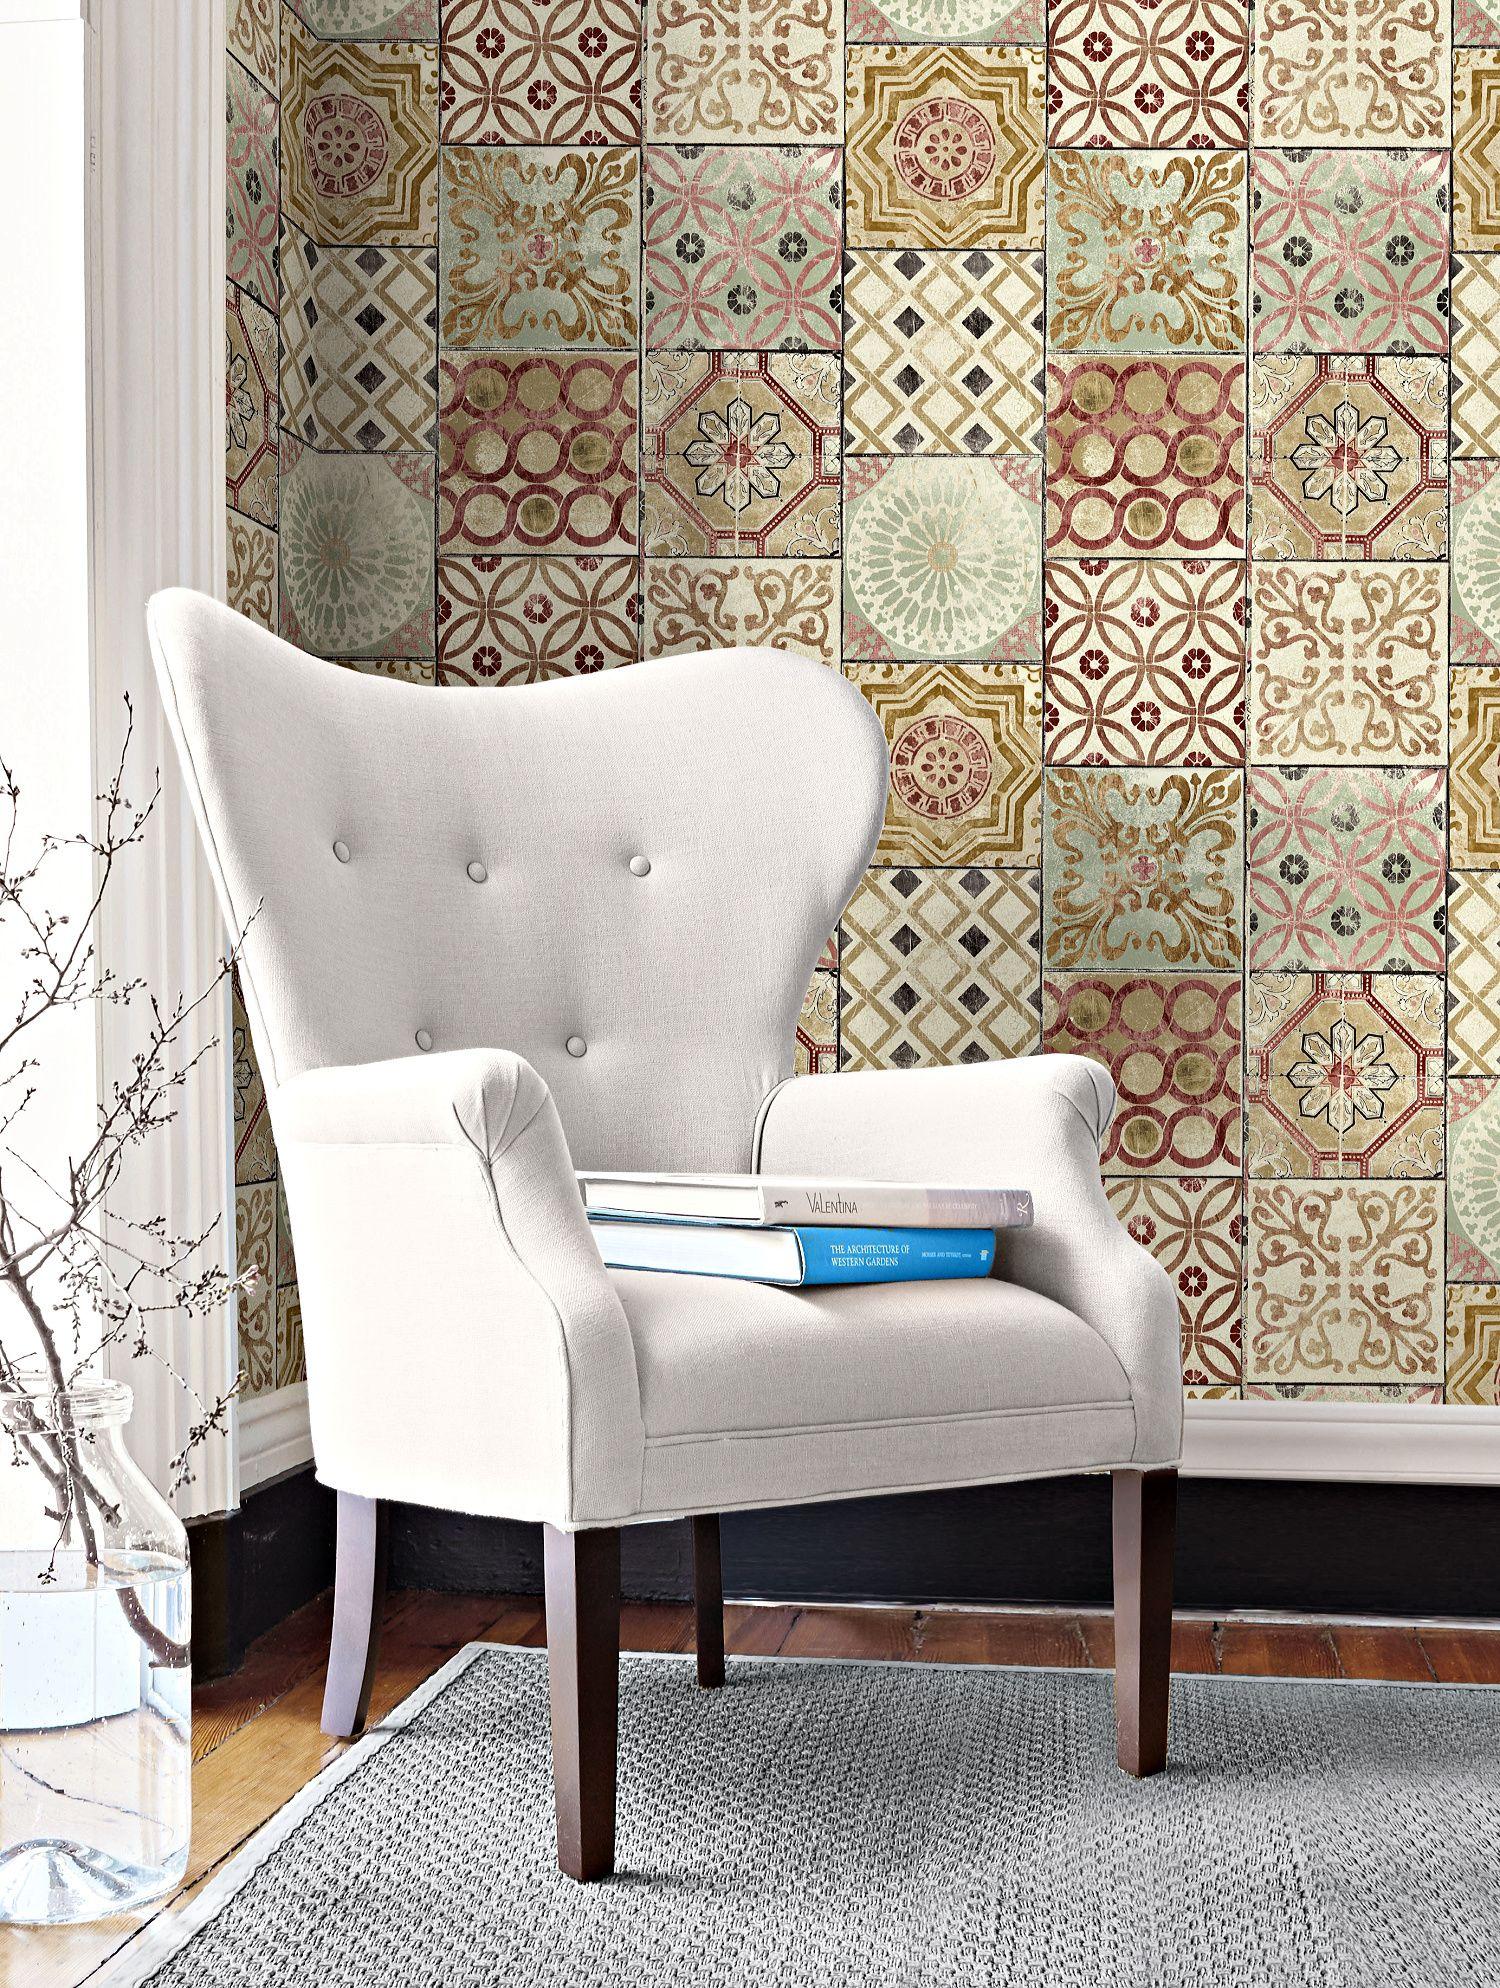 Gw1011 Moroccan Tiles Peel And Stick Wallpaper Gold Rust Celadon Peel And Stick Wallpaper Moroccan Tiles Moroccan Tiles Pattern